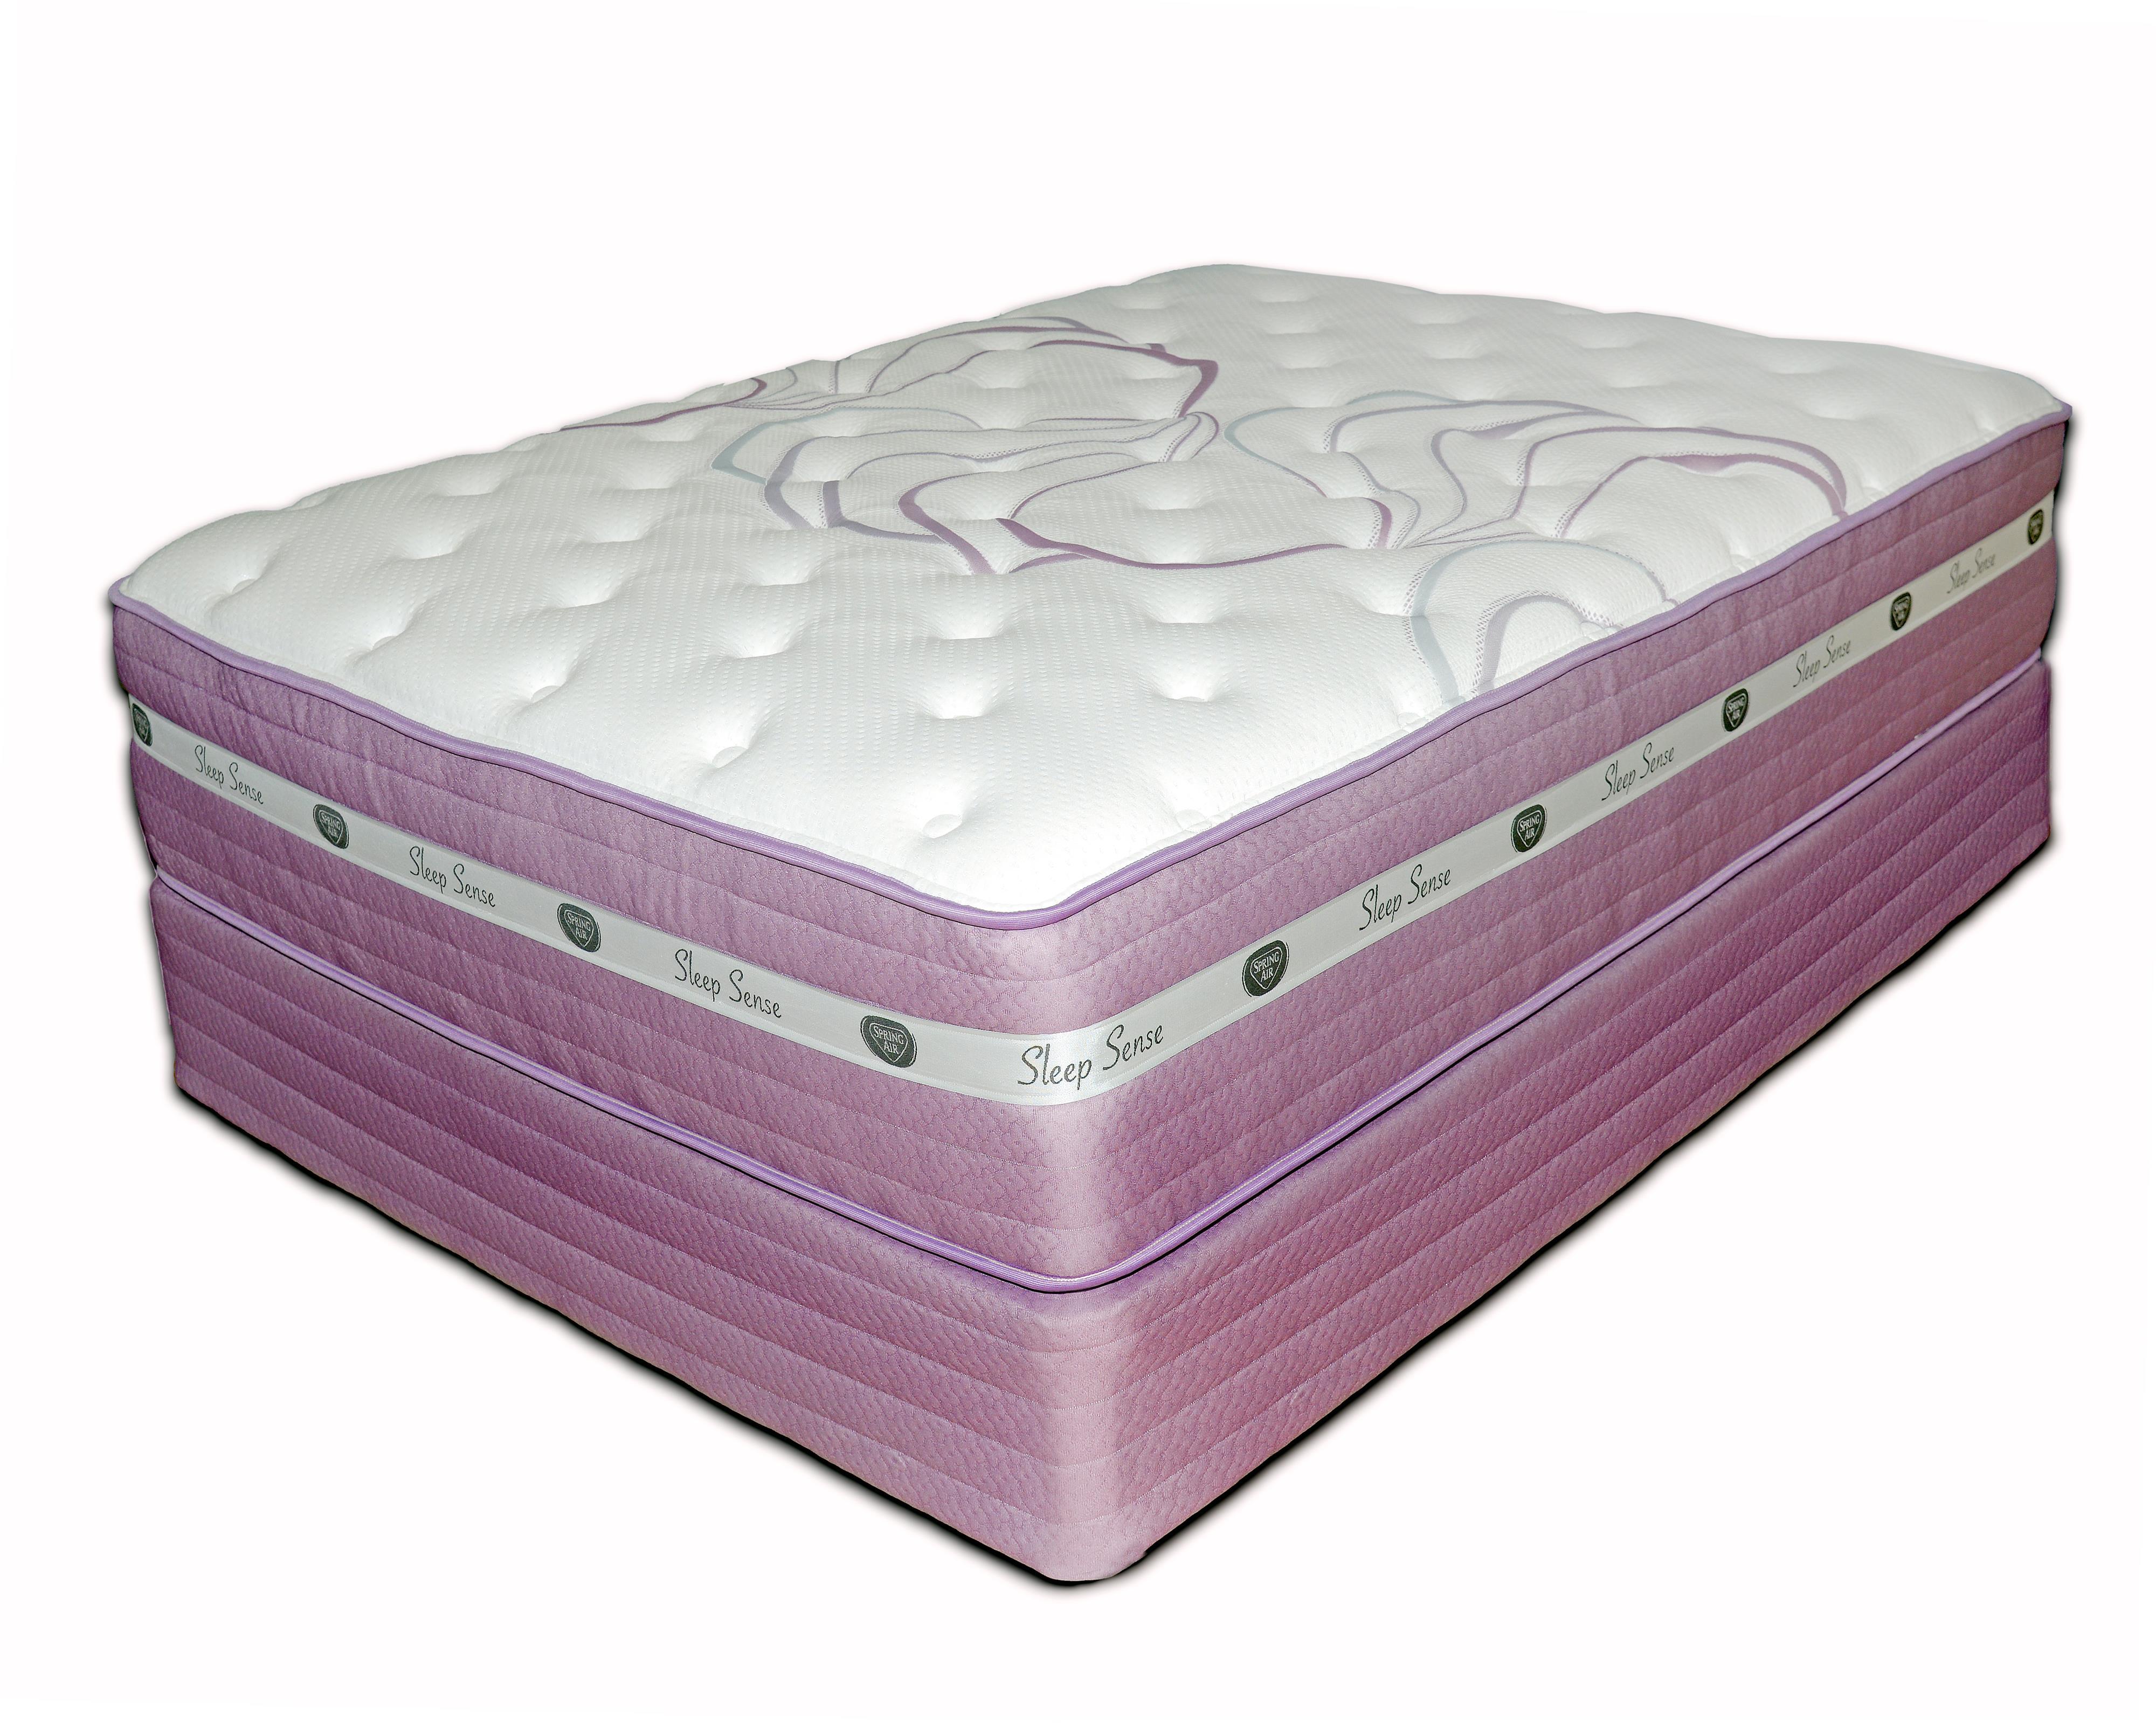 "Sleep Sense Purple Full 14.5"" Plush Hybrid Mattress by Spring Air at Mueller Furniture"